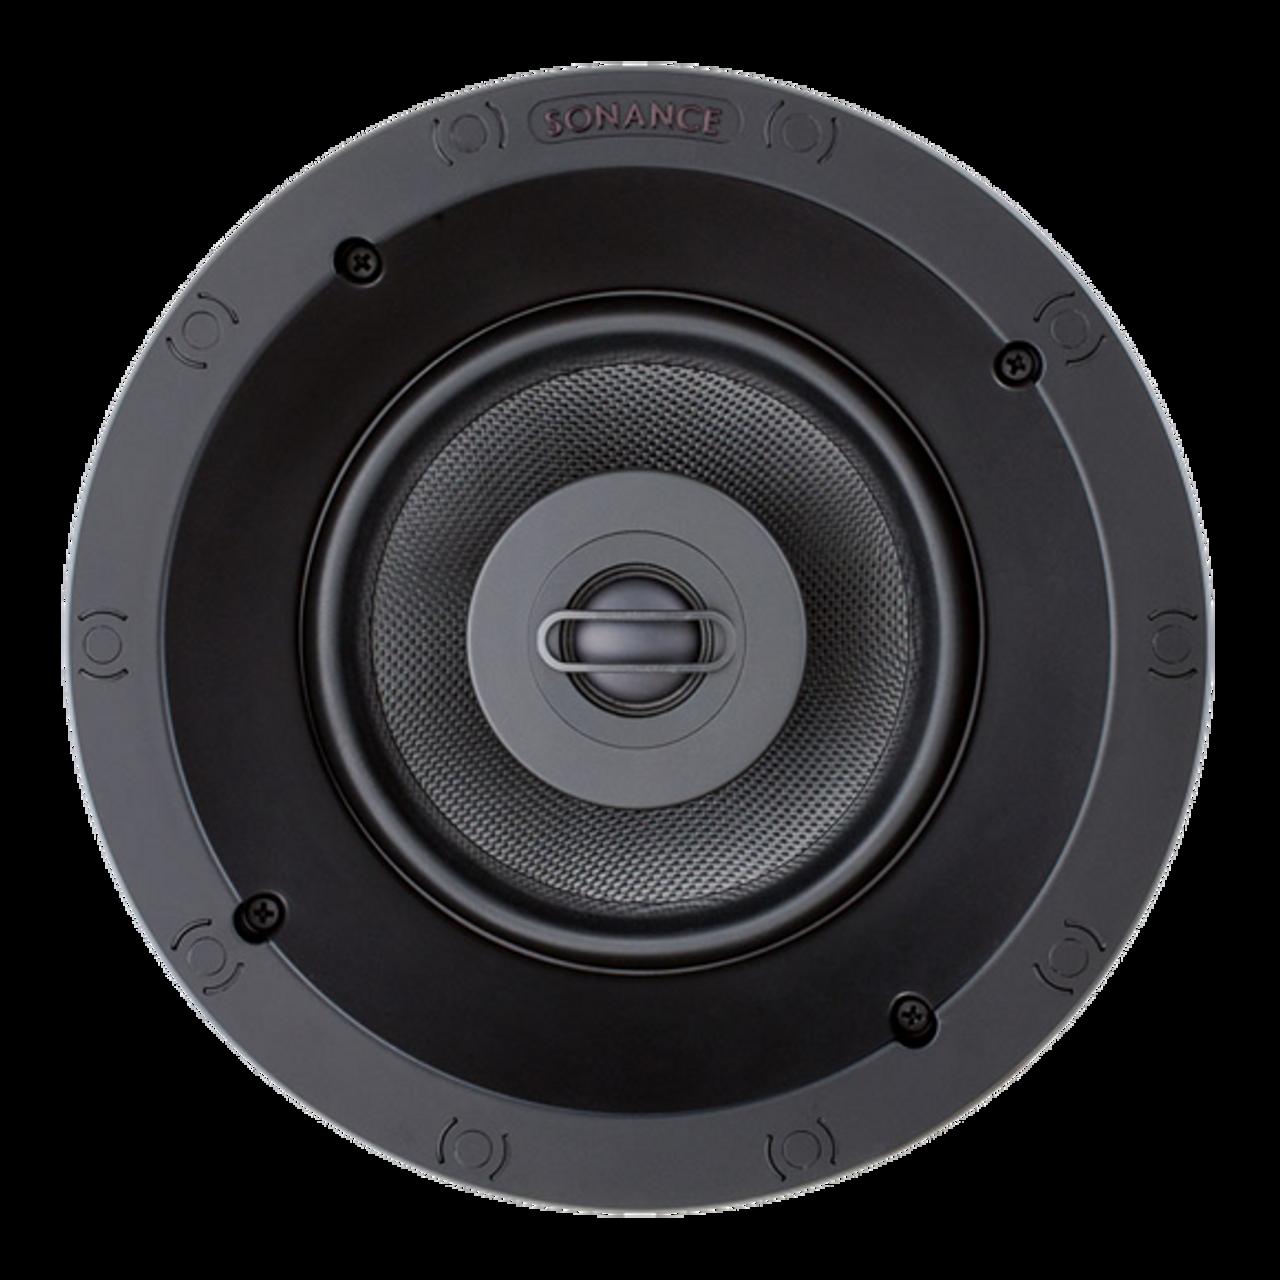 Sonance Vp66r Tl 6 Quot In Ceiling Thinline Round Speakers